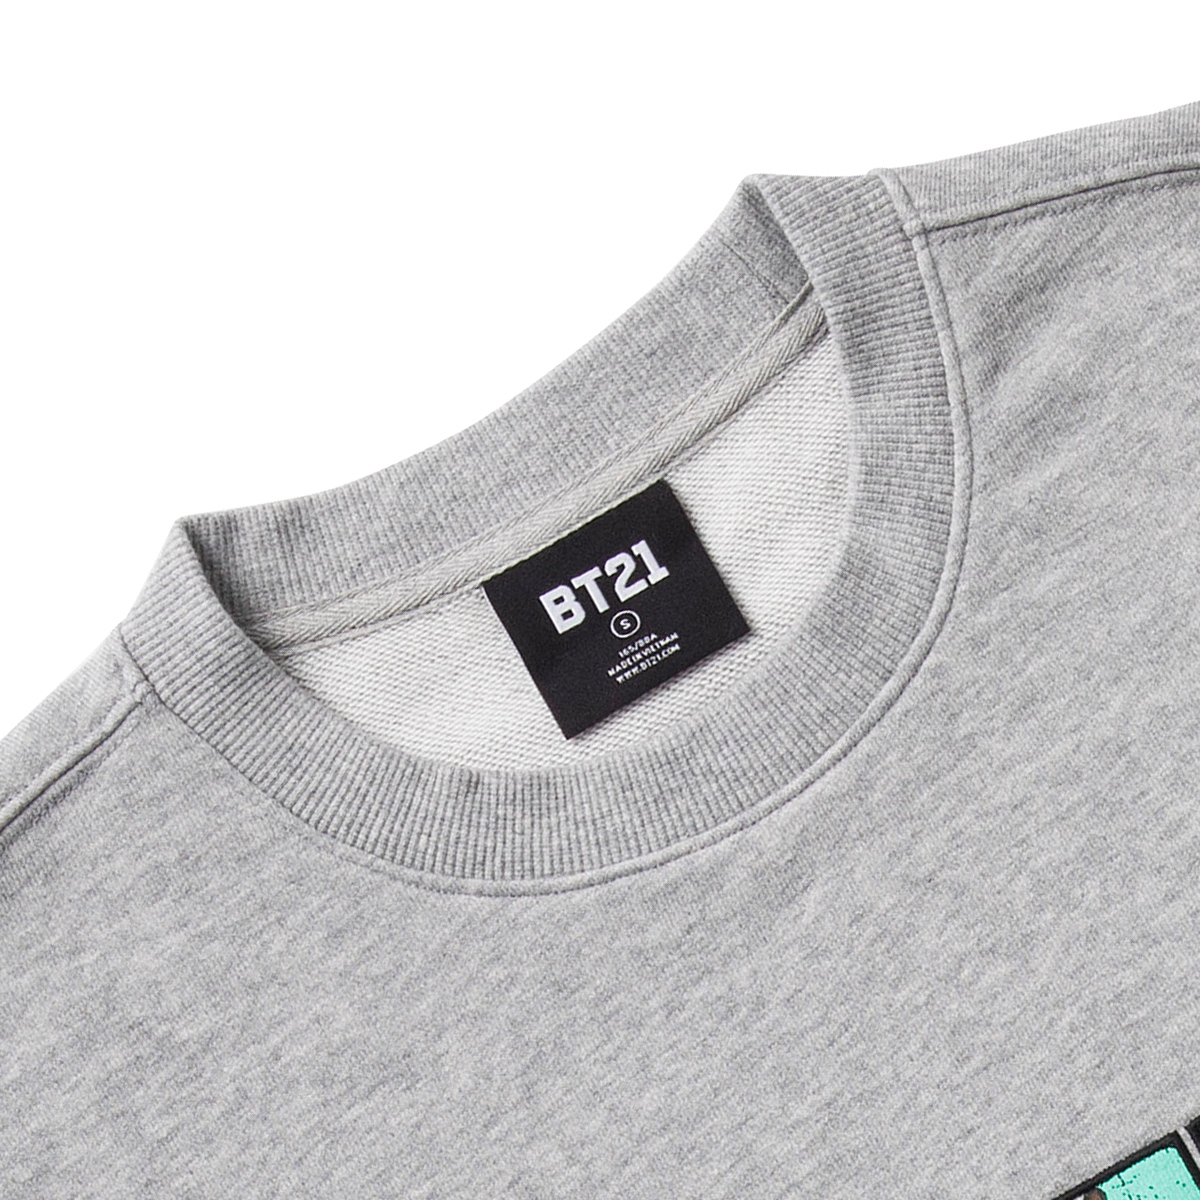 BT21 SHOOKY 코믹팝 스웻셔츠